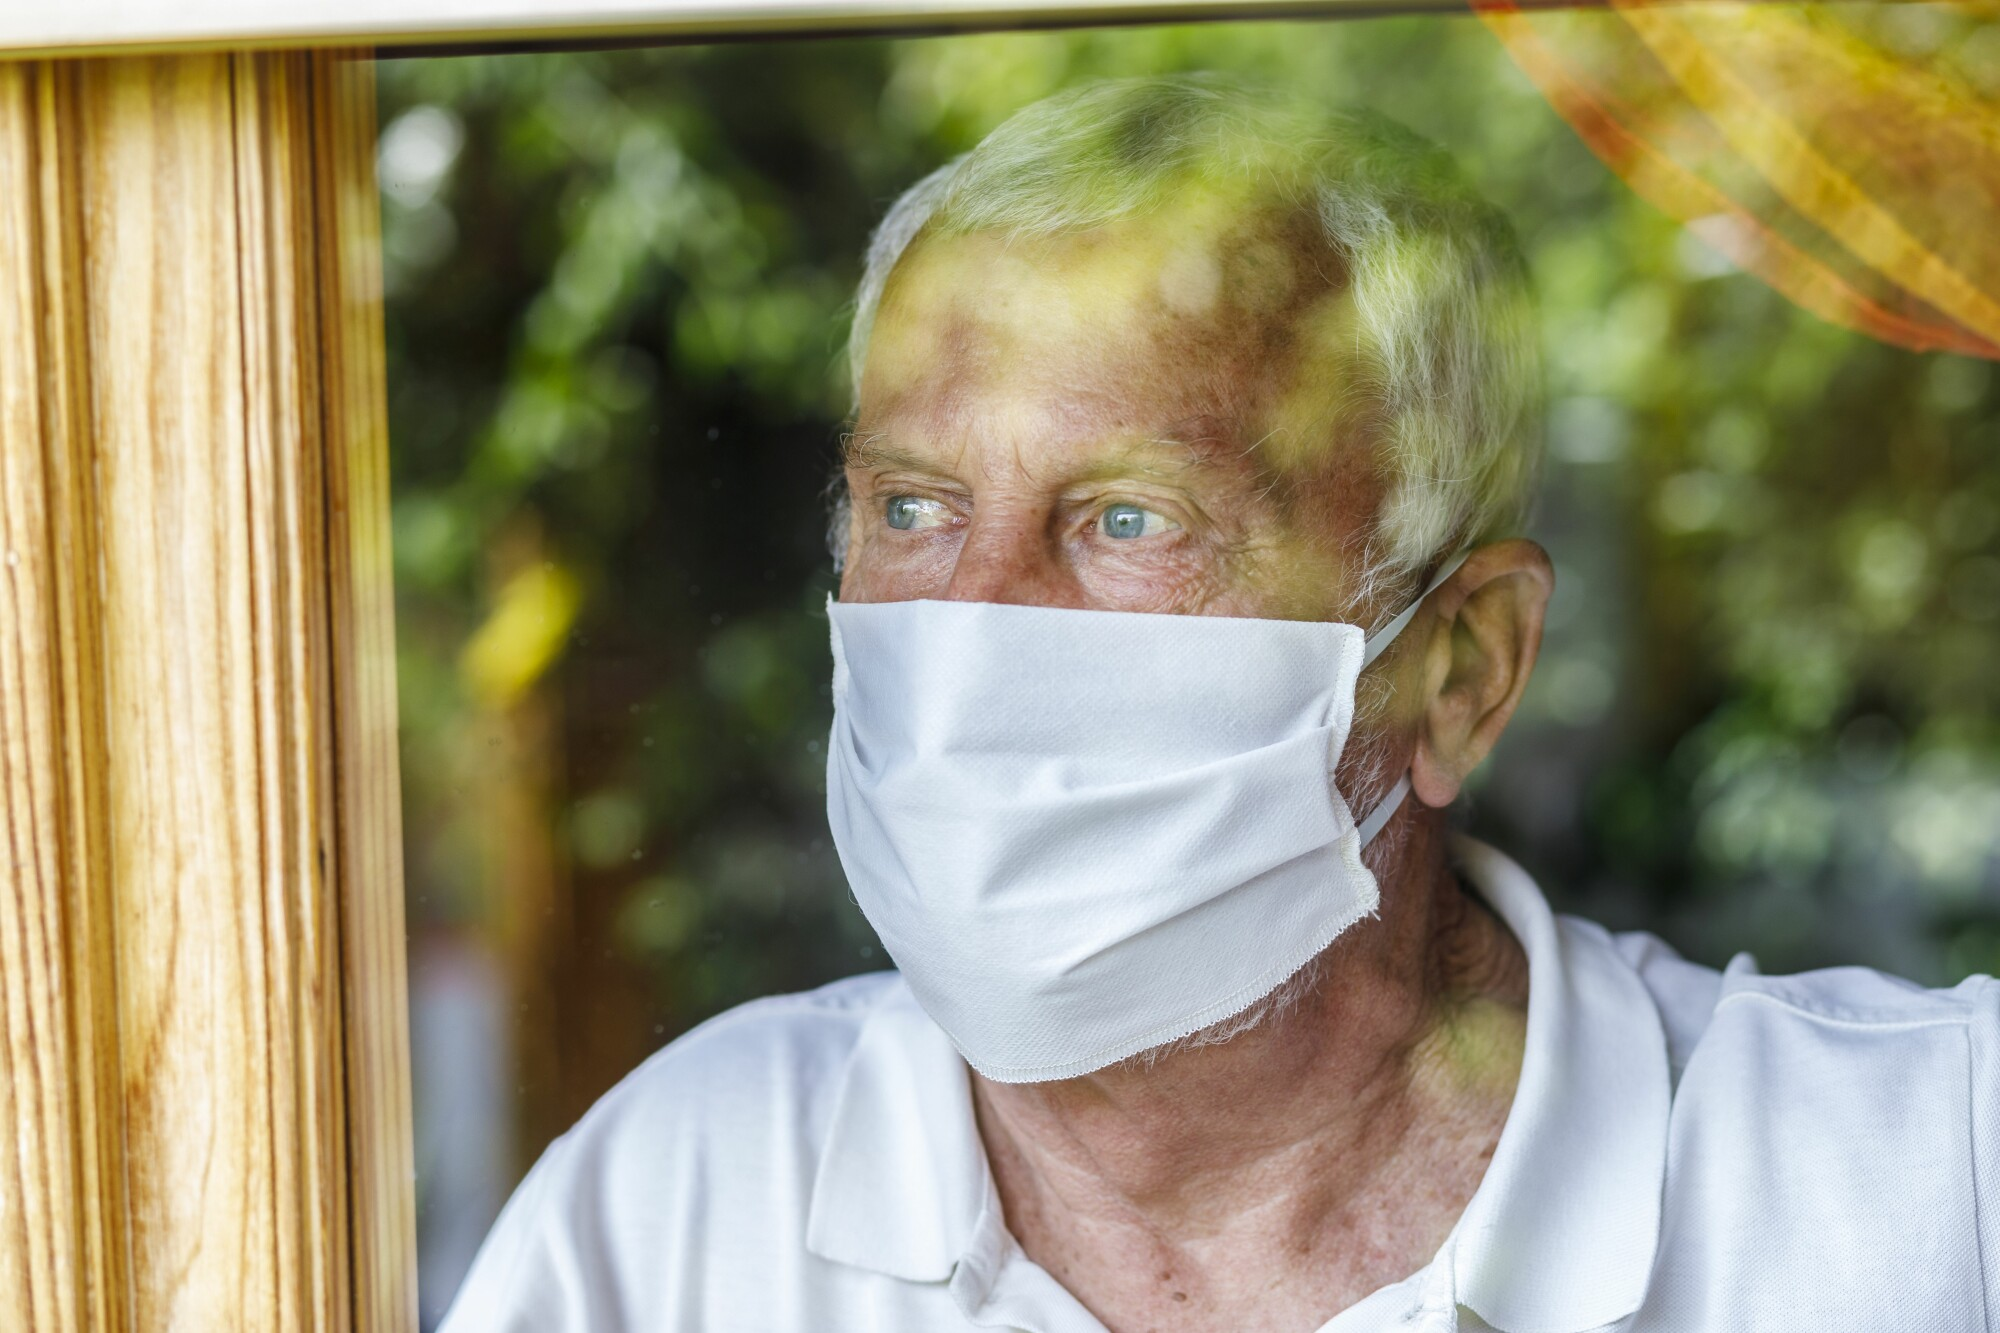 Isolated Elderly Man